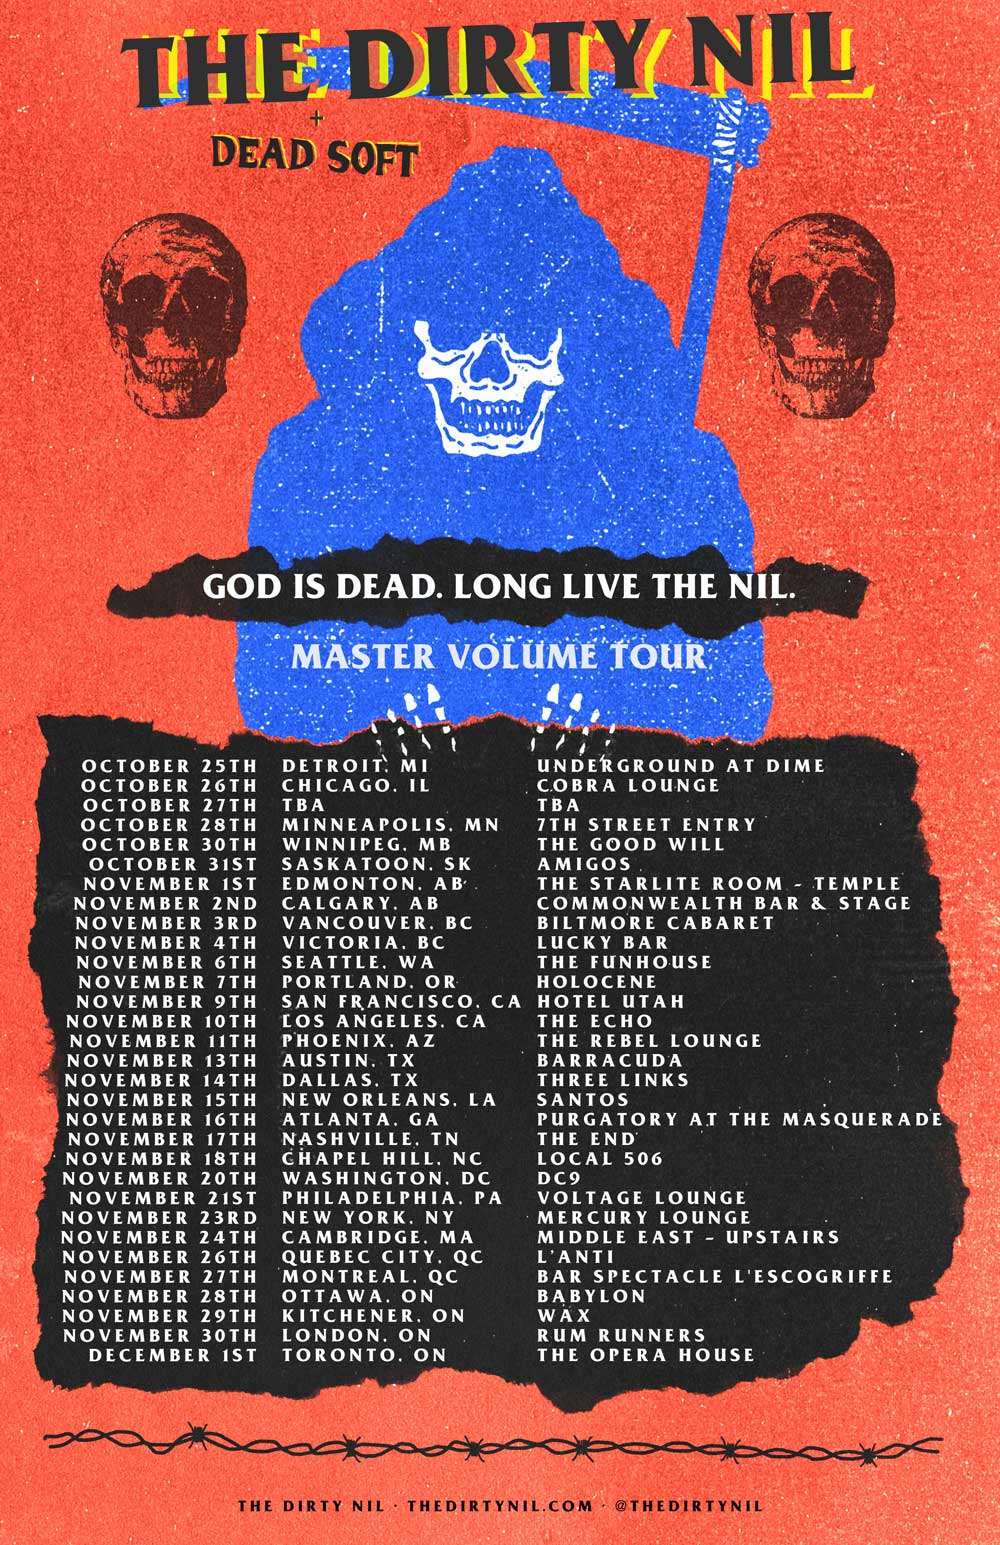 Dirty-Nil-2018-US-TOUR-FLYER-11X17-Color.jpg